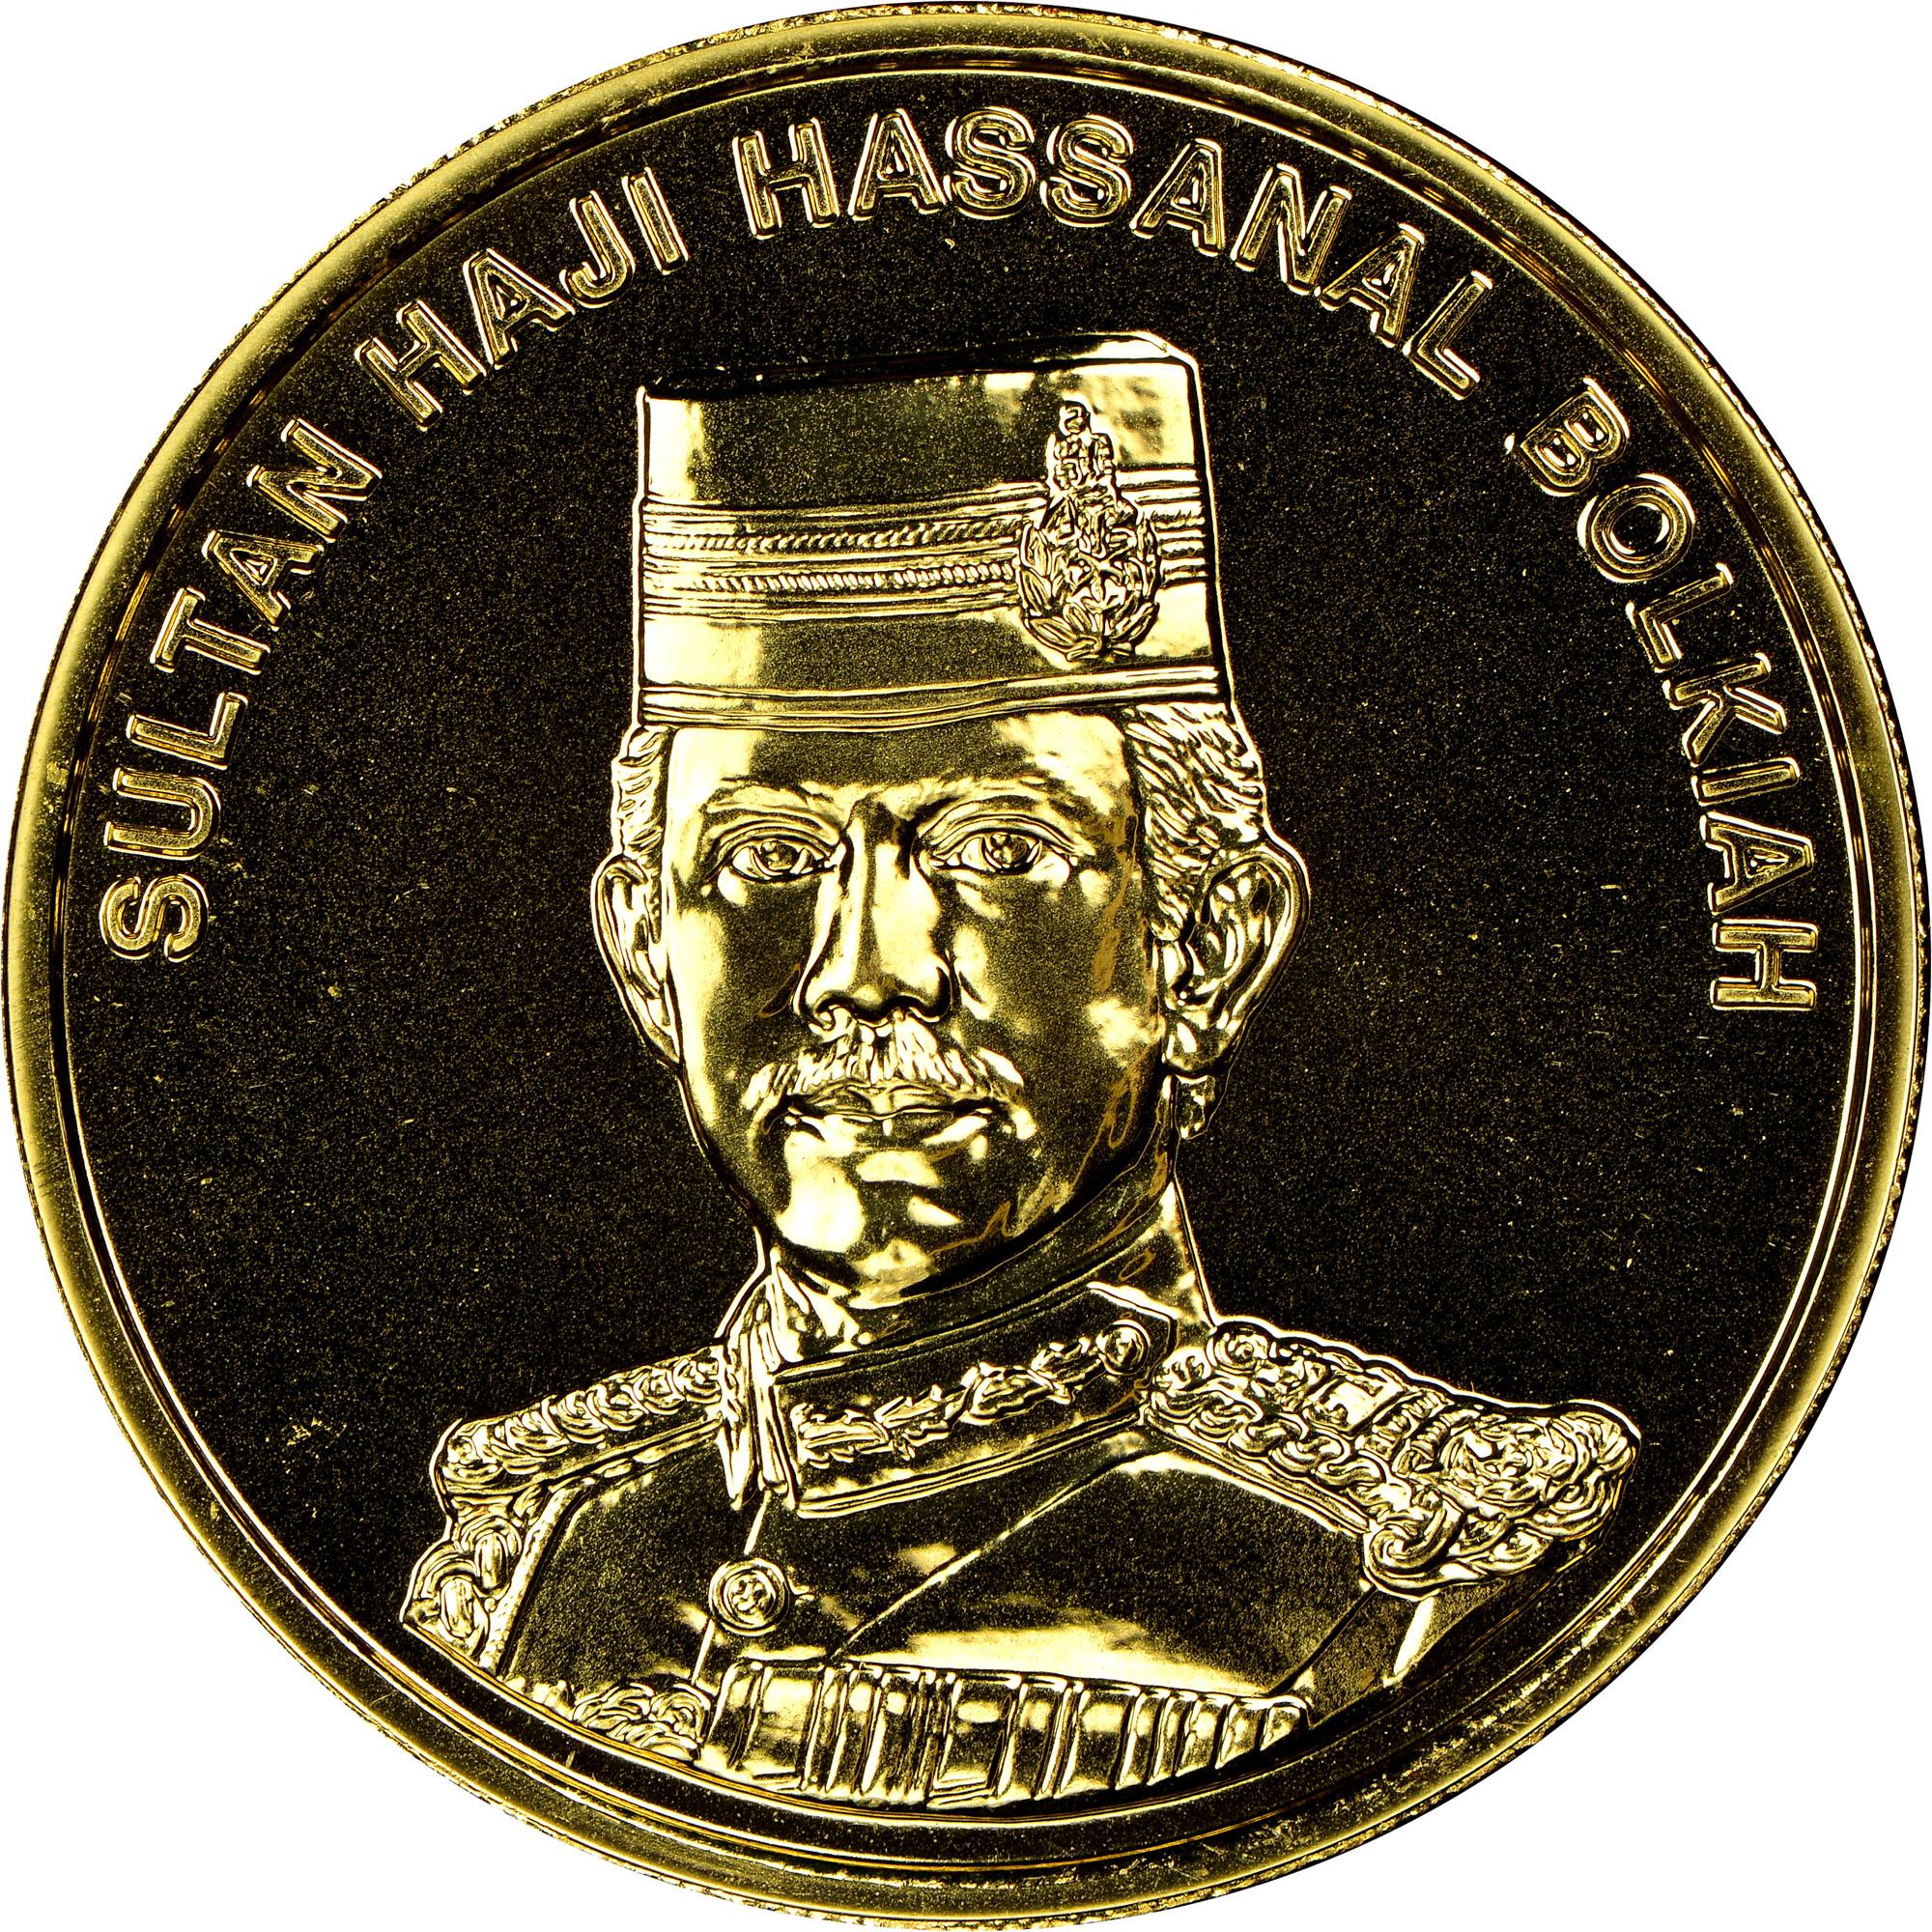 (1994) Brunei 1000 Dollars obverse